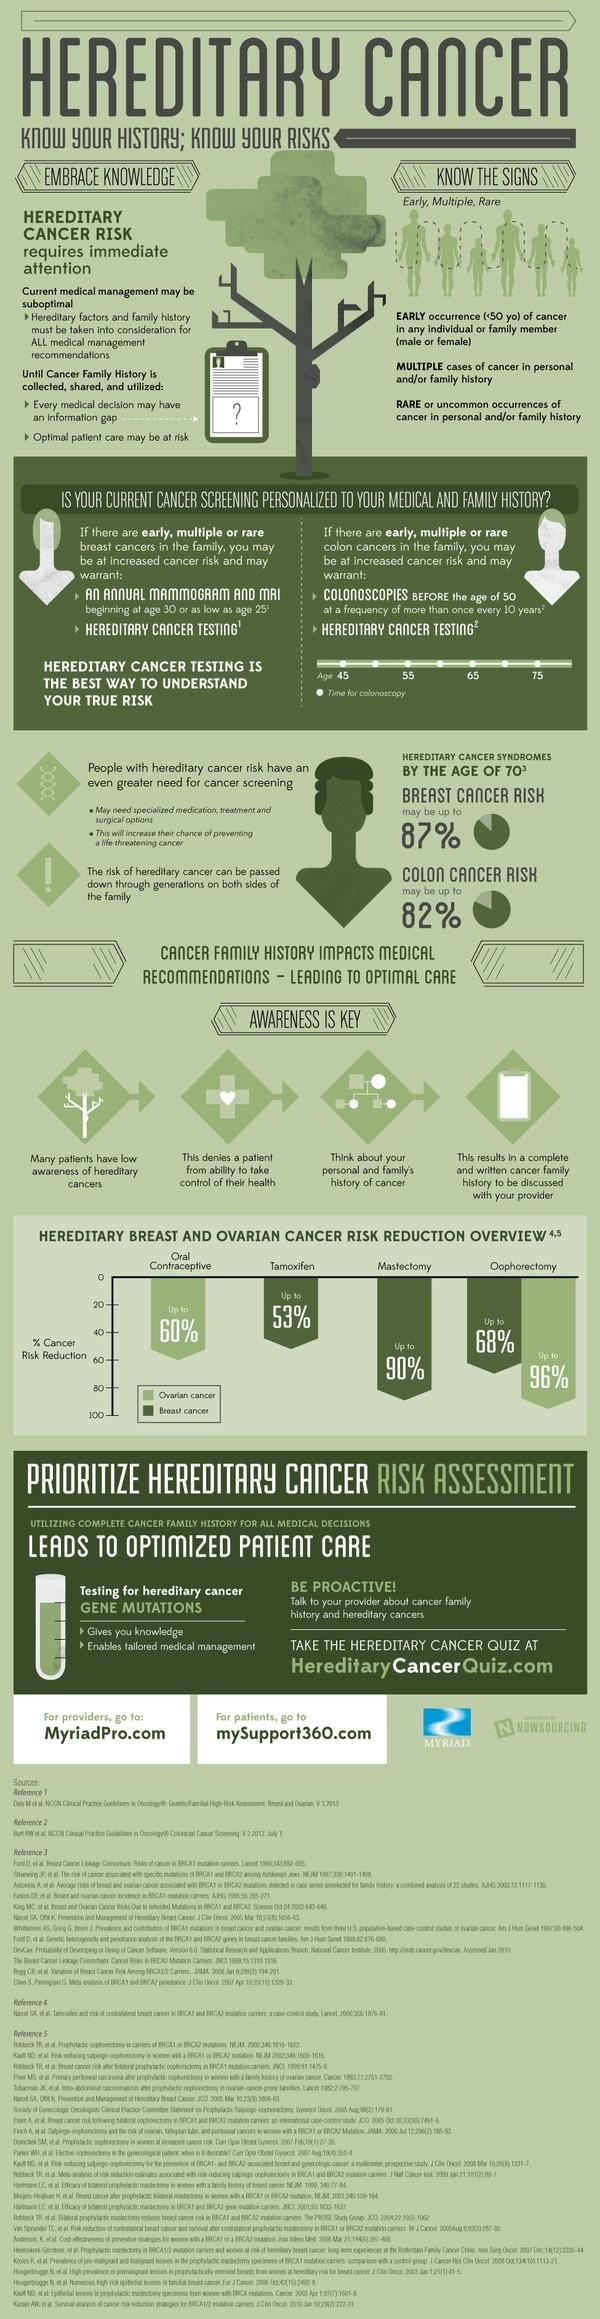 Hereditary Cancer #infographic